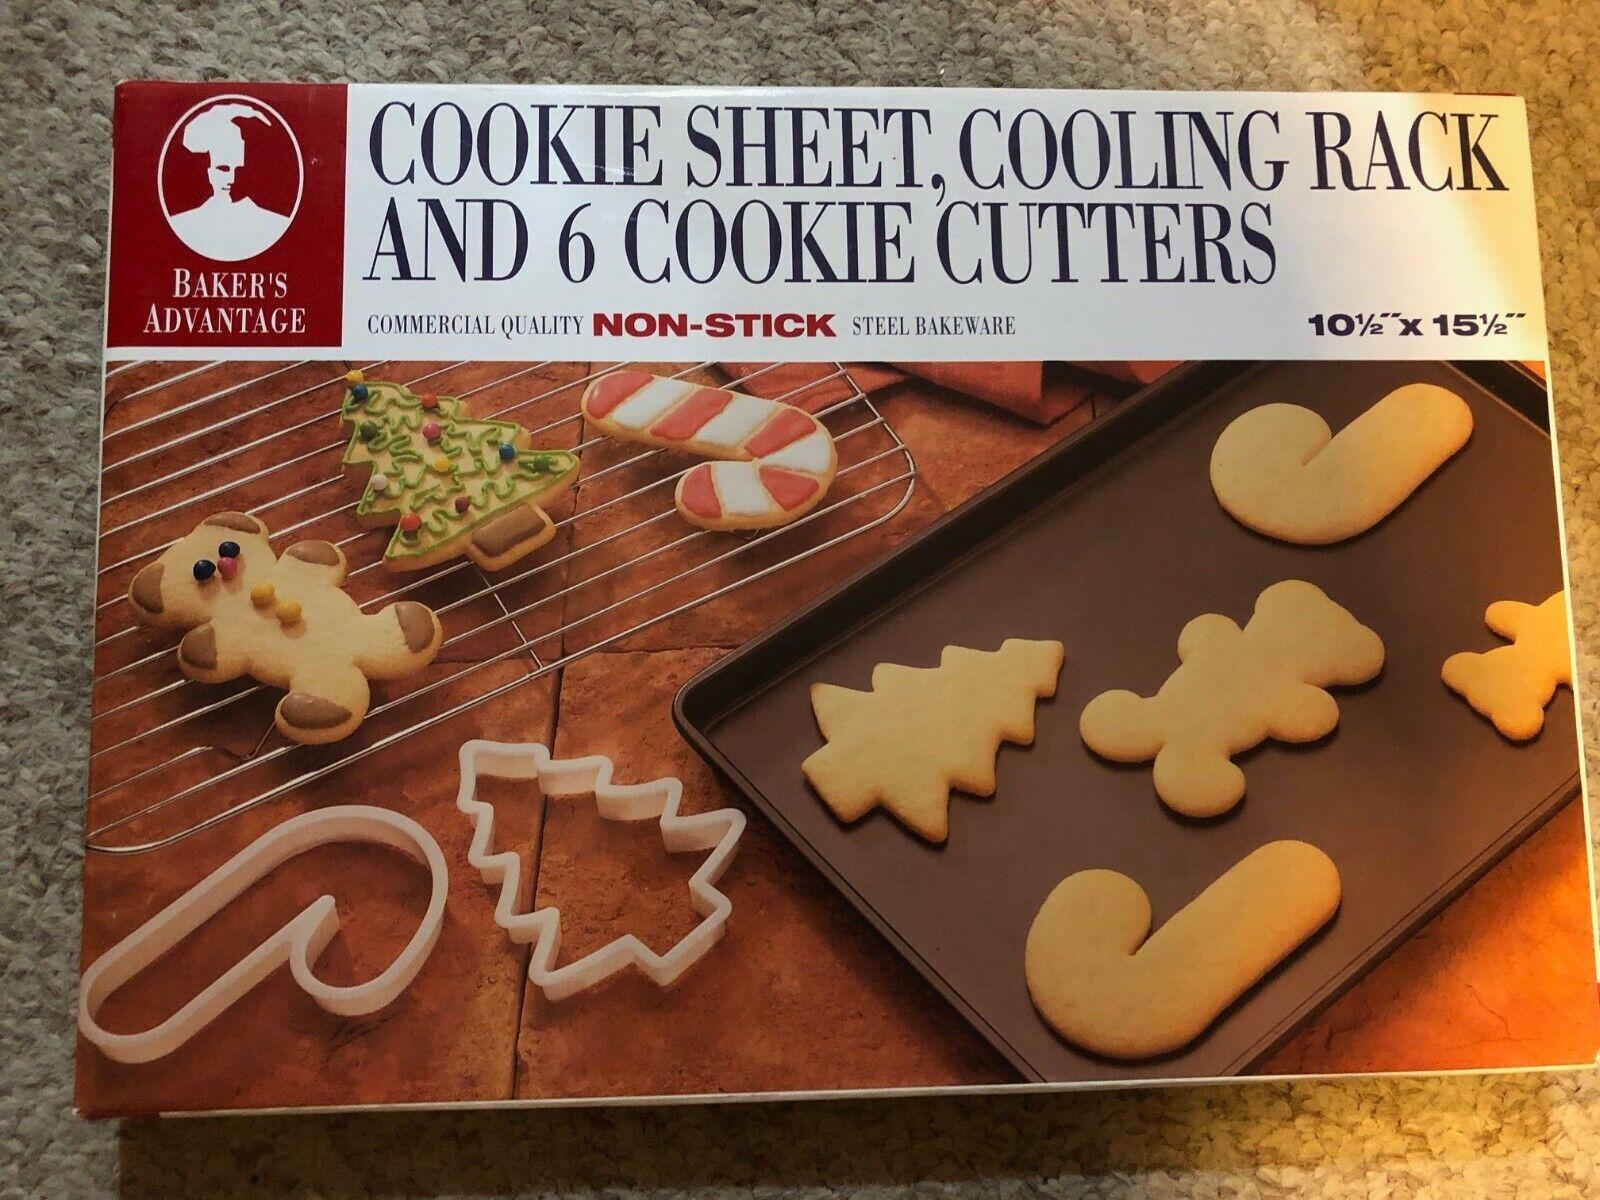 NIB Baker's Advantage Christmas Baking Set - Cookie Sheet, R